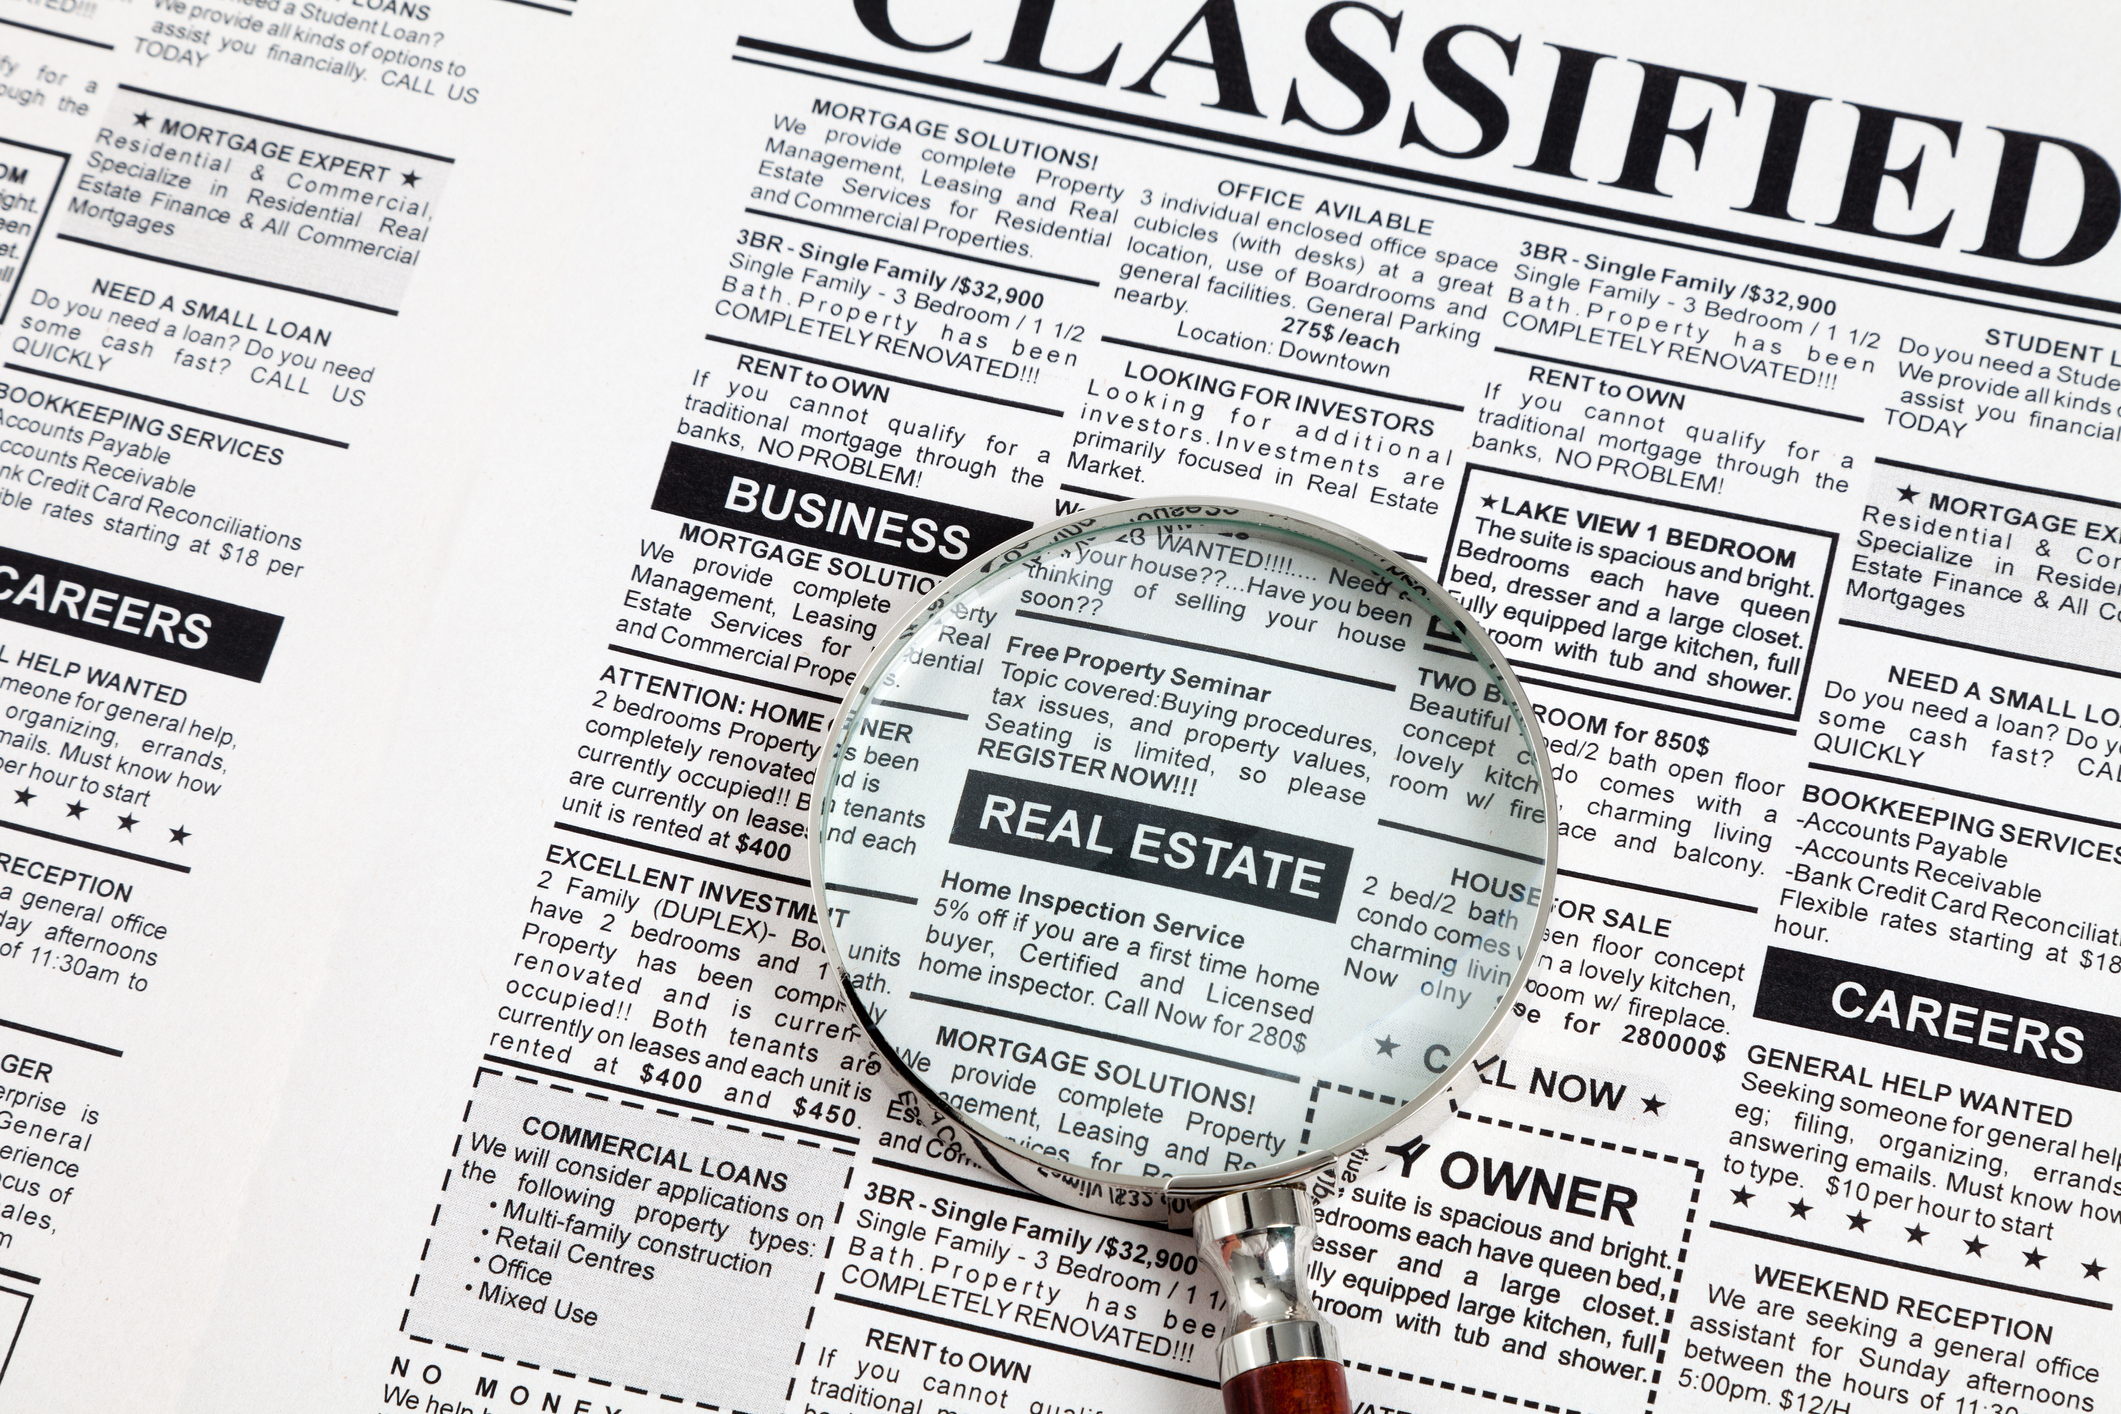 Classified ads in the newspaper